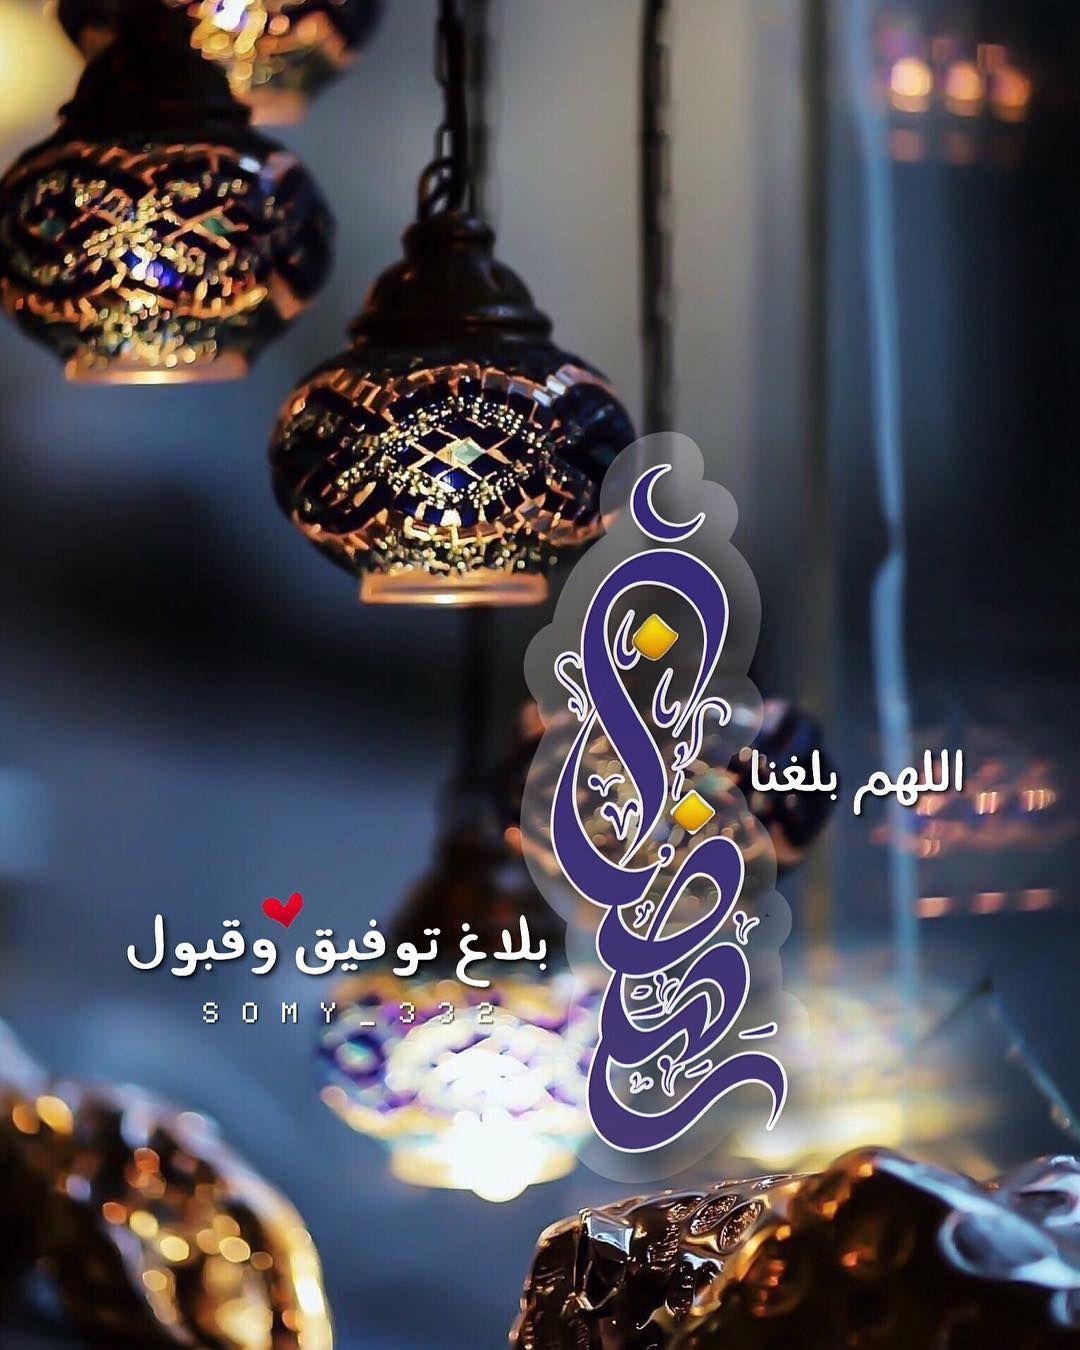 92 Likes 13 Comments مصممة فوتوشب Elhamlololo On Instagram هاهي أول جمعة من شهر الرحمة أسآل الله لي Ramadan Quotes Ramadan Lantern Ramadan Decorations